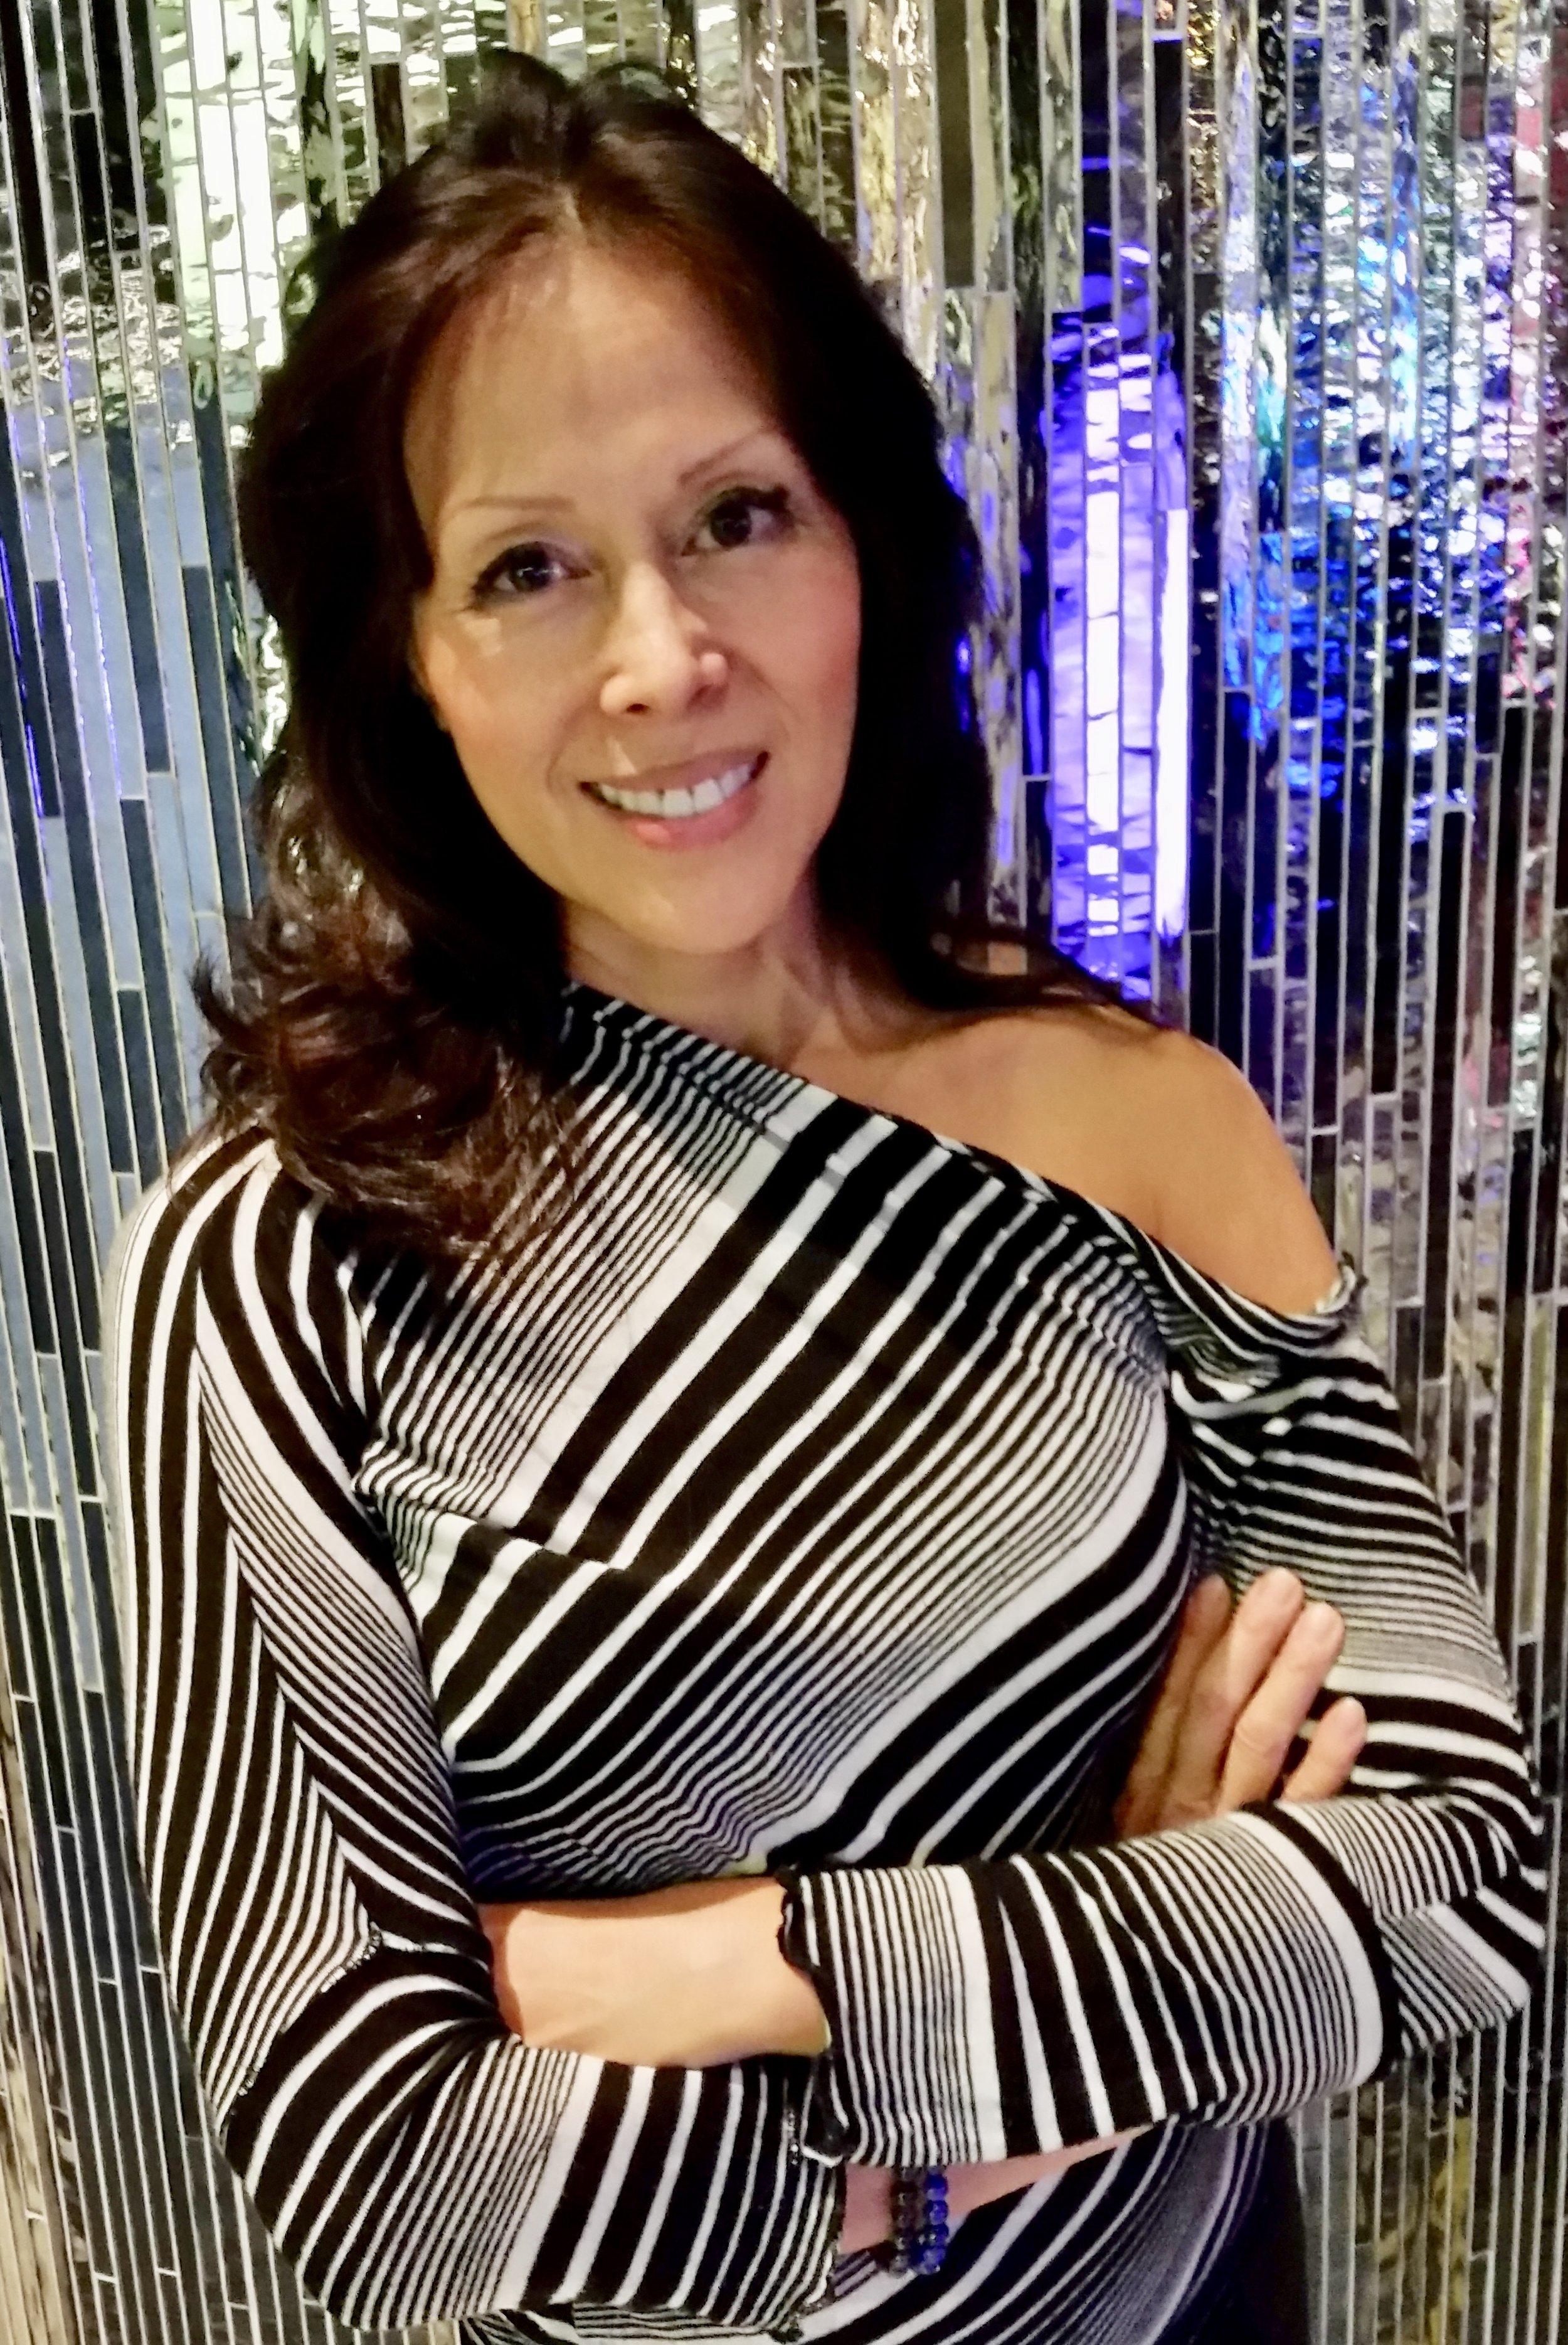 Joyce Orias, AIA, Your Sacred Space Visionary